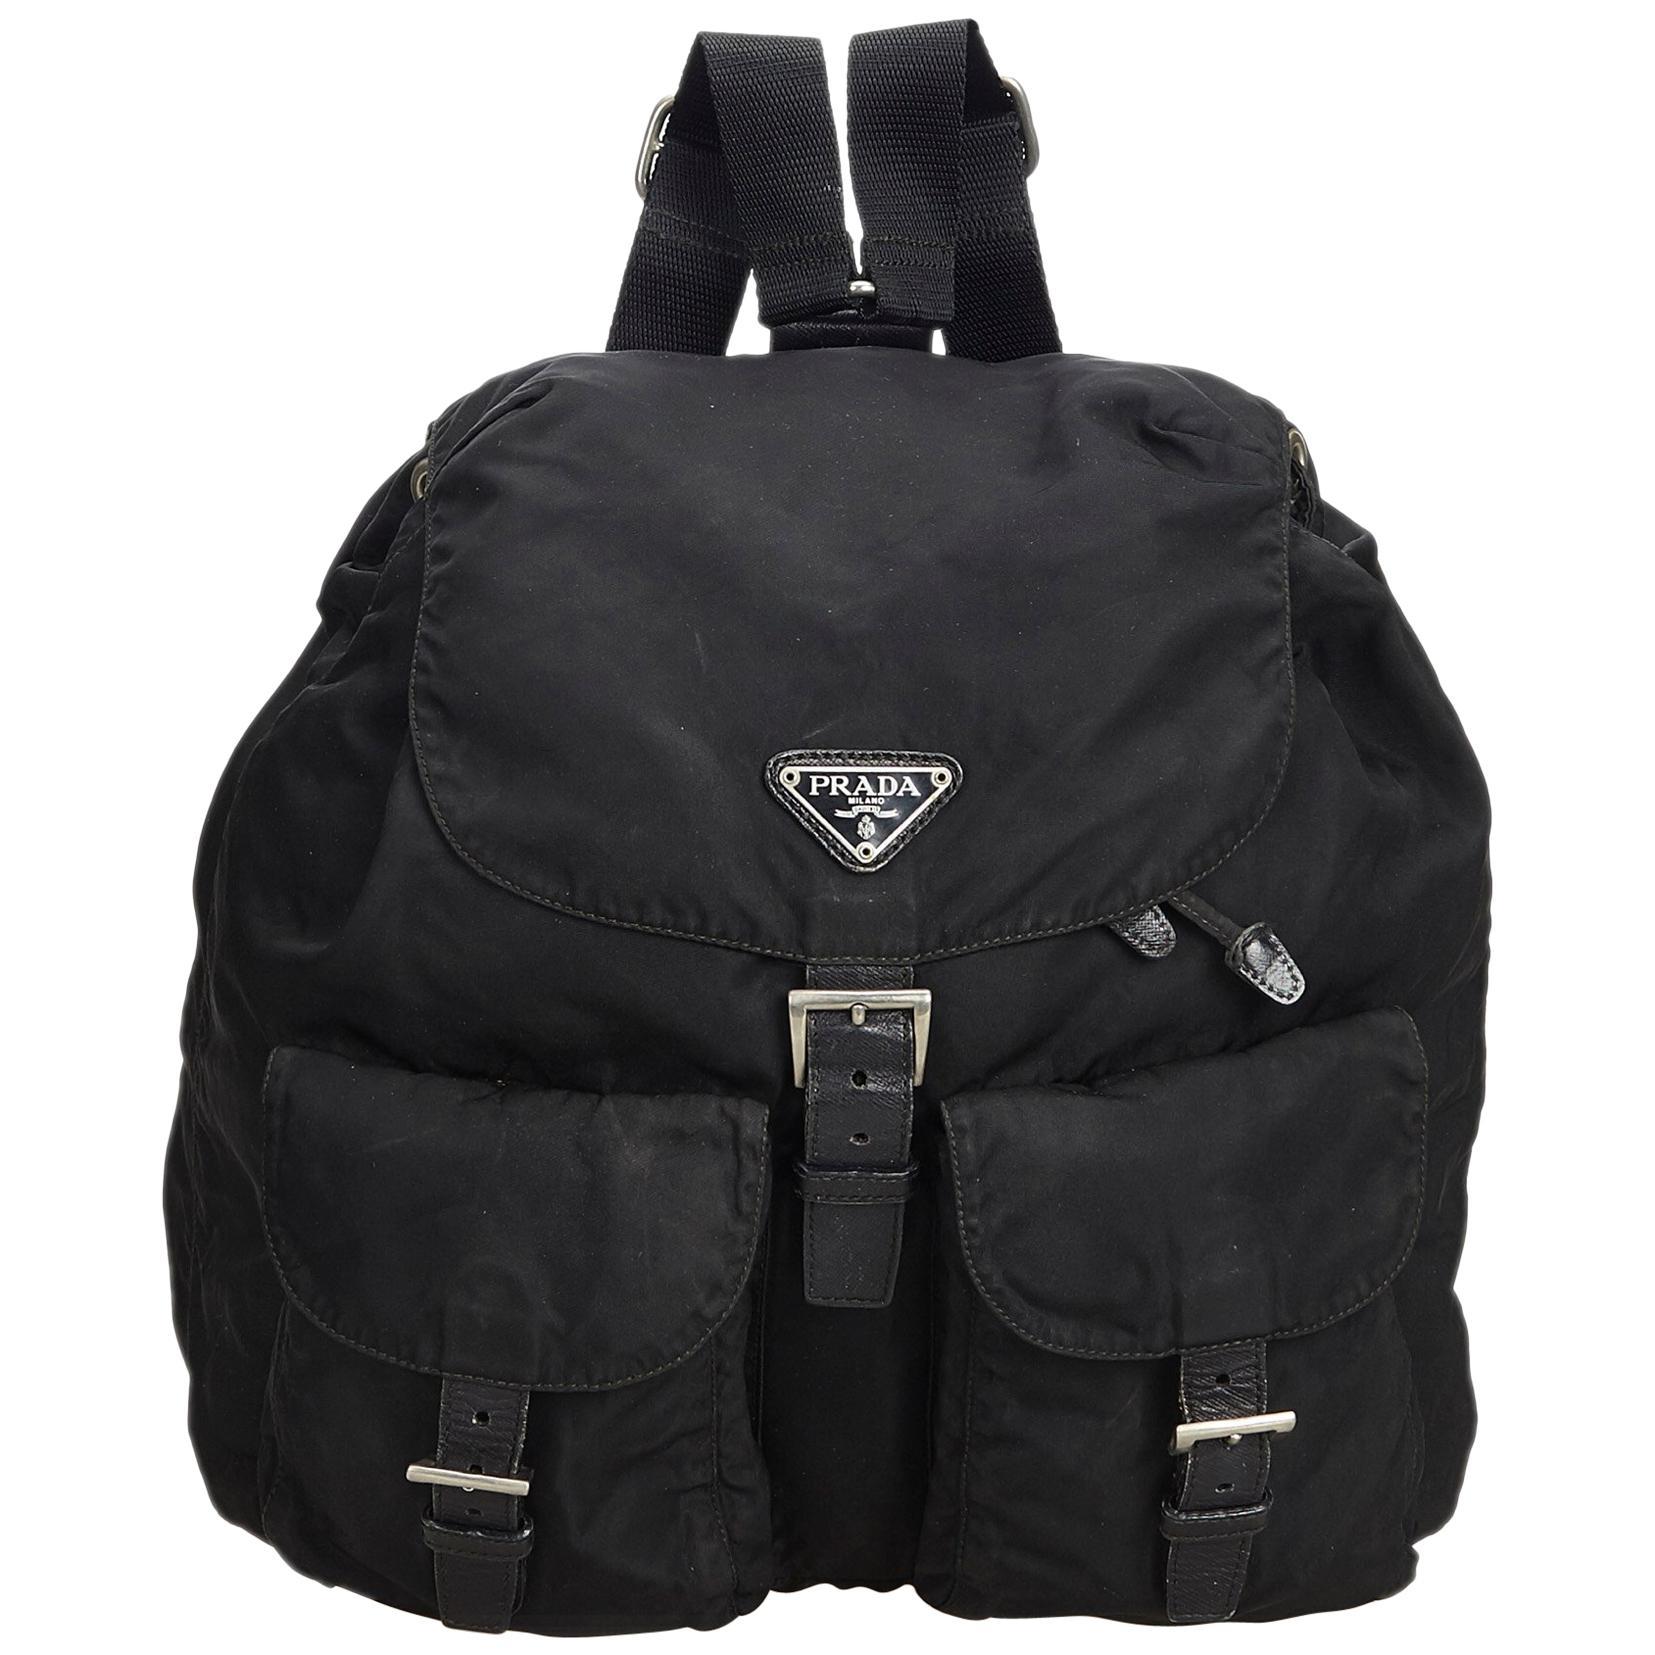 624938584dfc Vintage Prada Handbags and Purses - 1